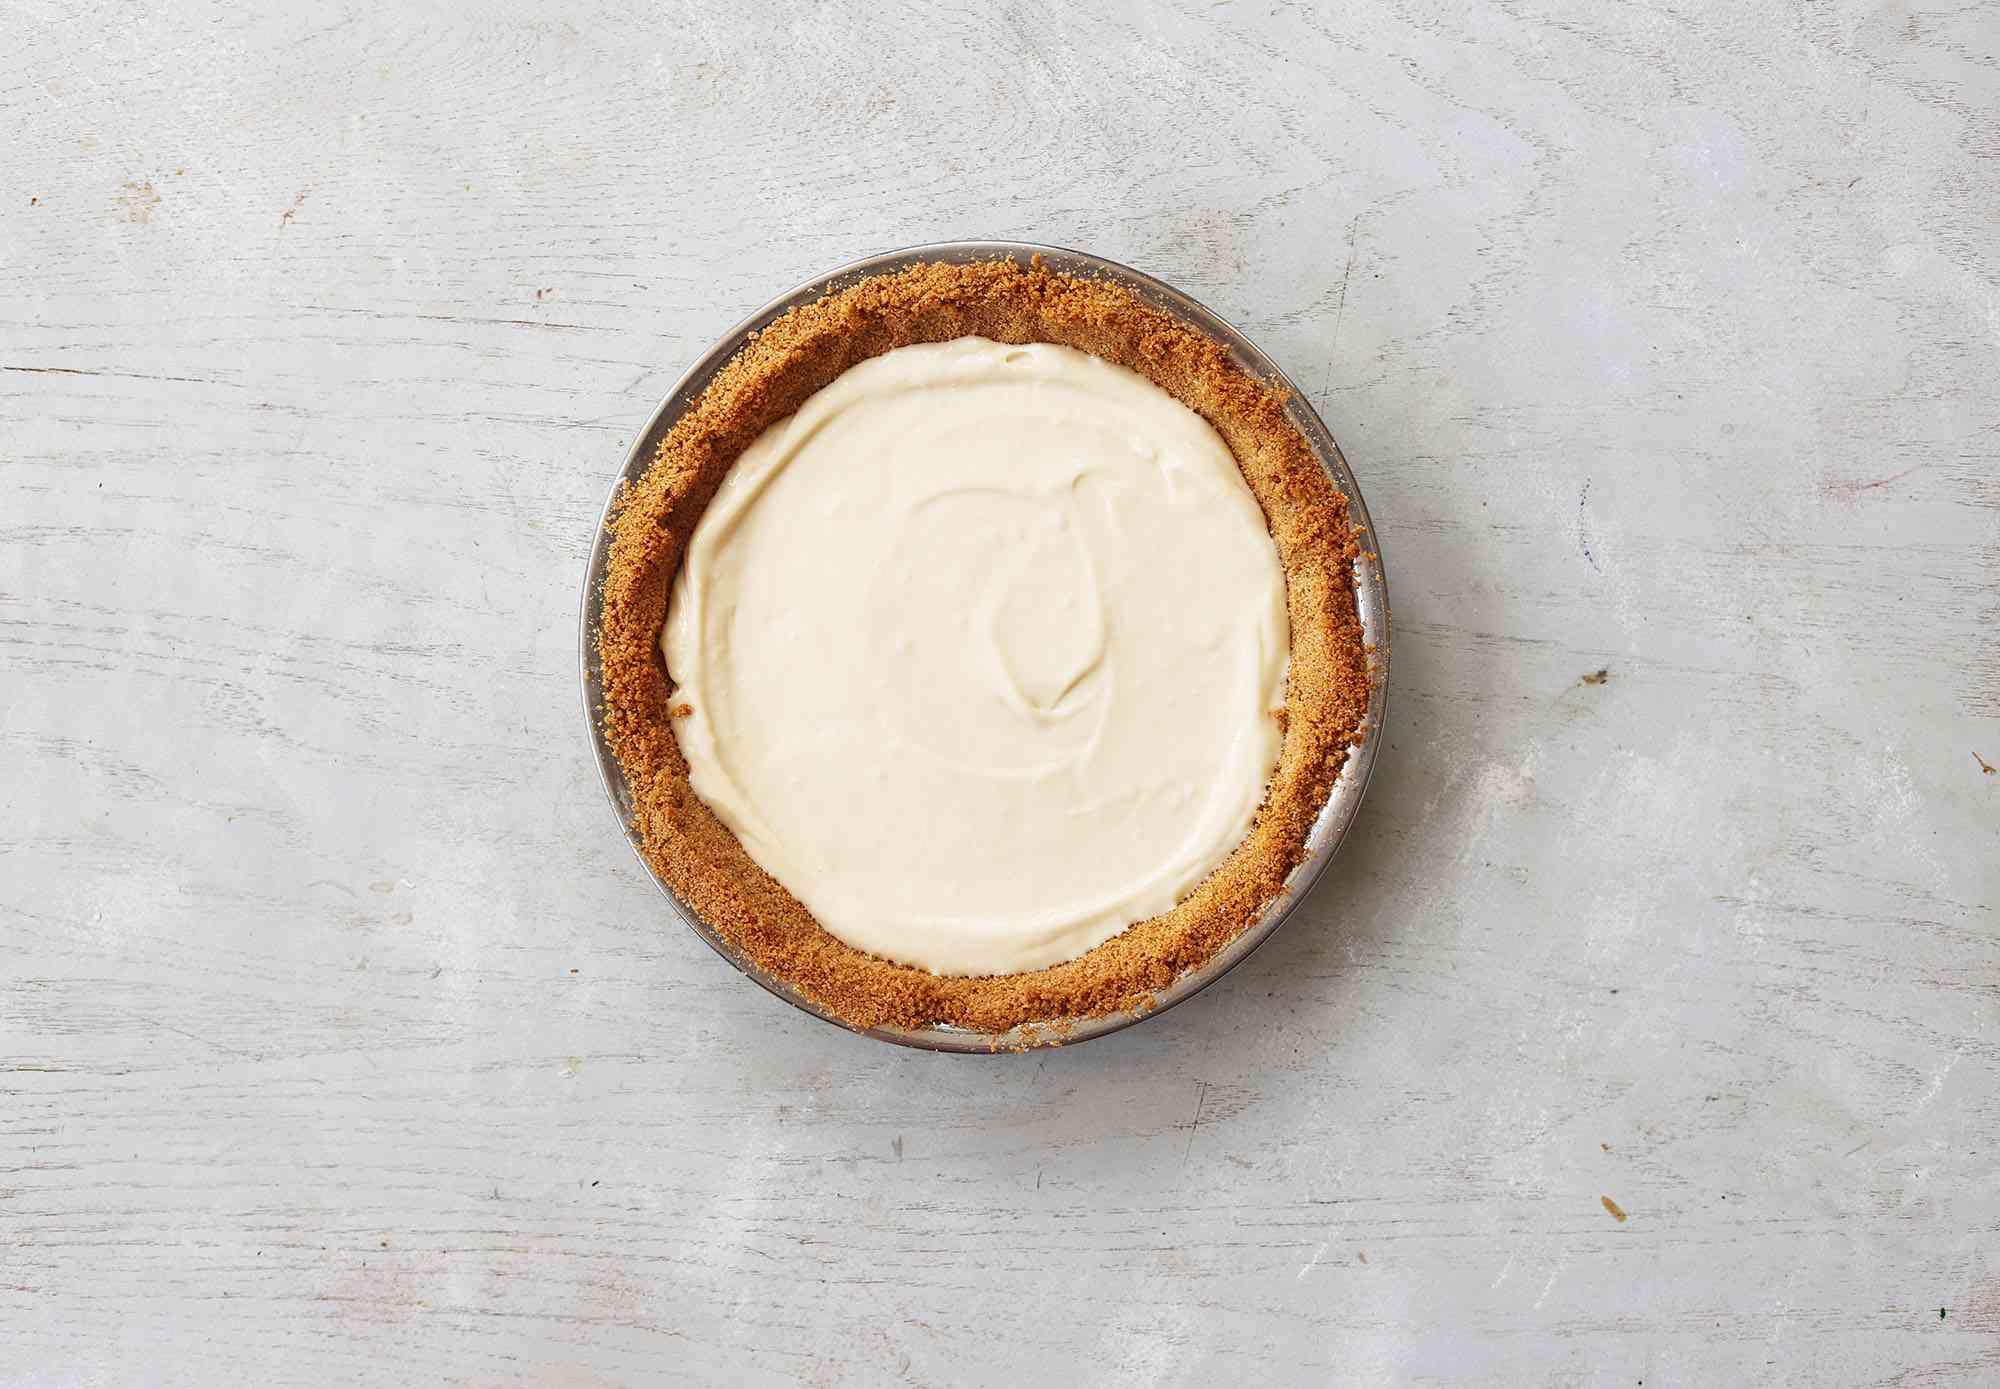 Cream cheese filling in graham cracker crust